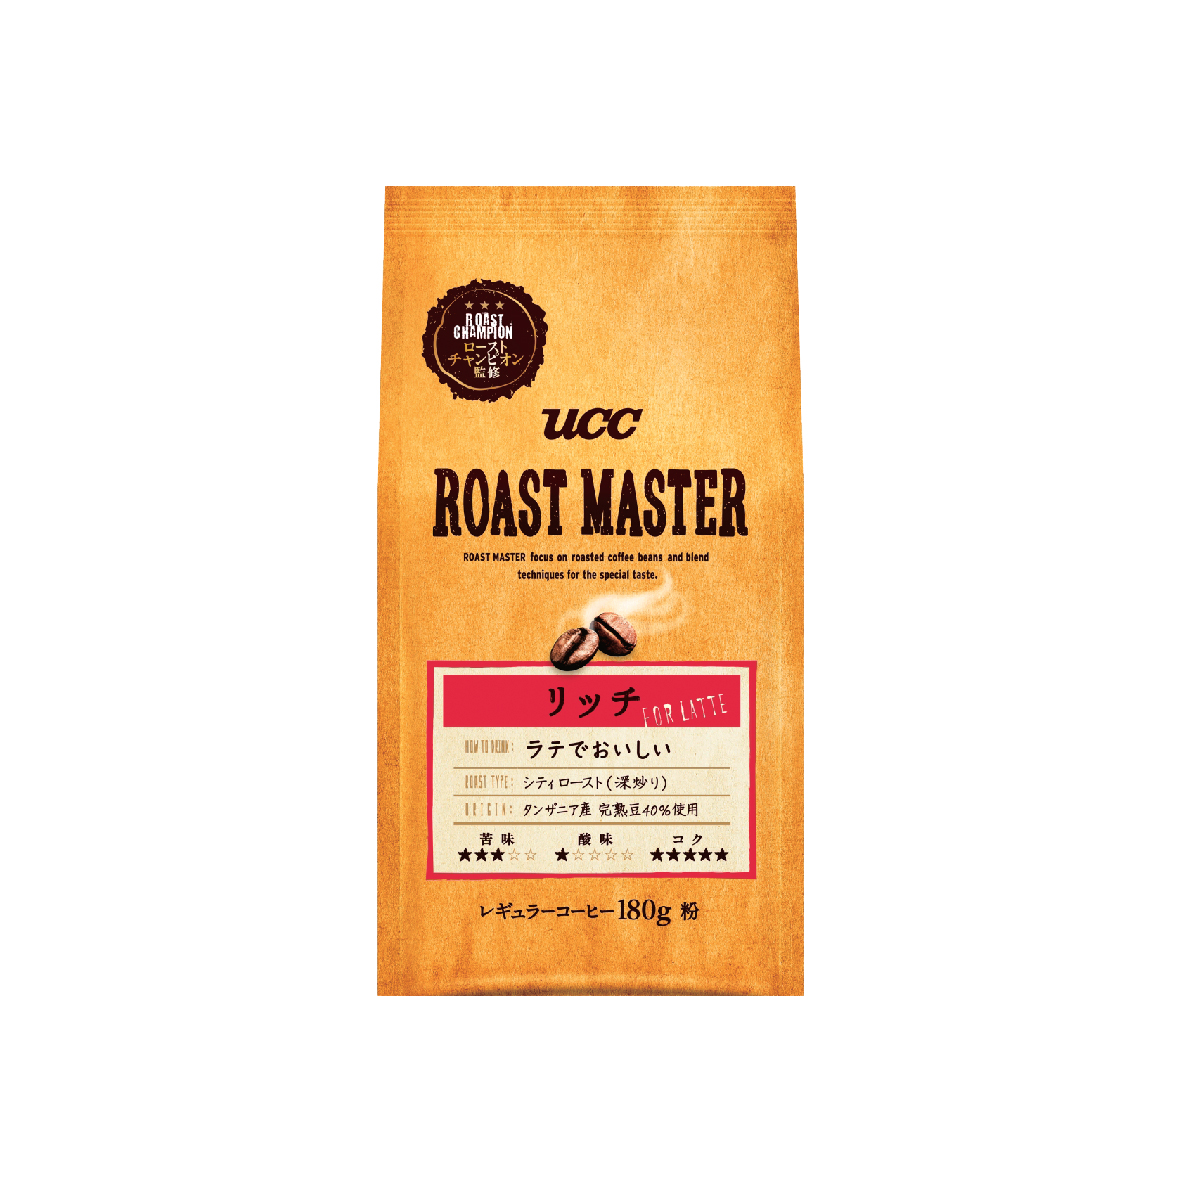 UCC Roast Master Rich Coffee Ground Coffee